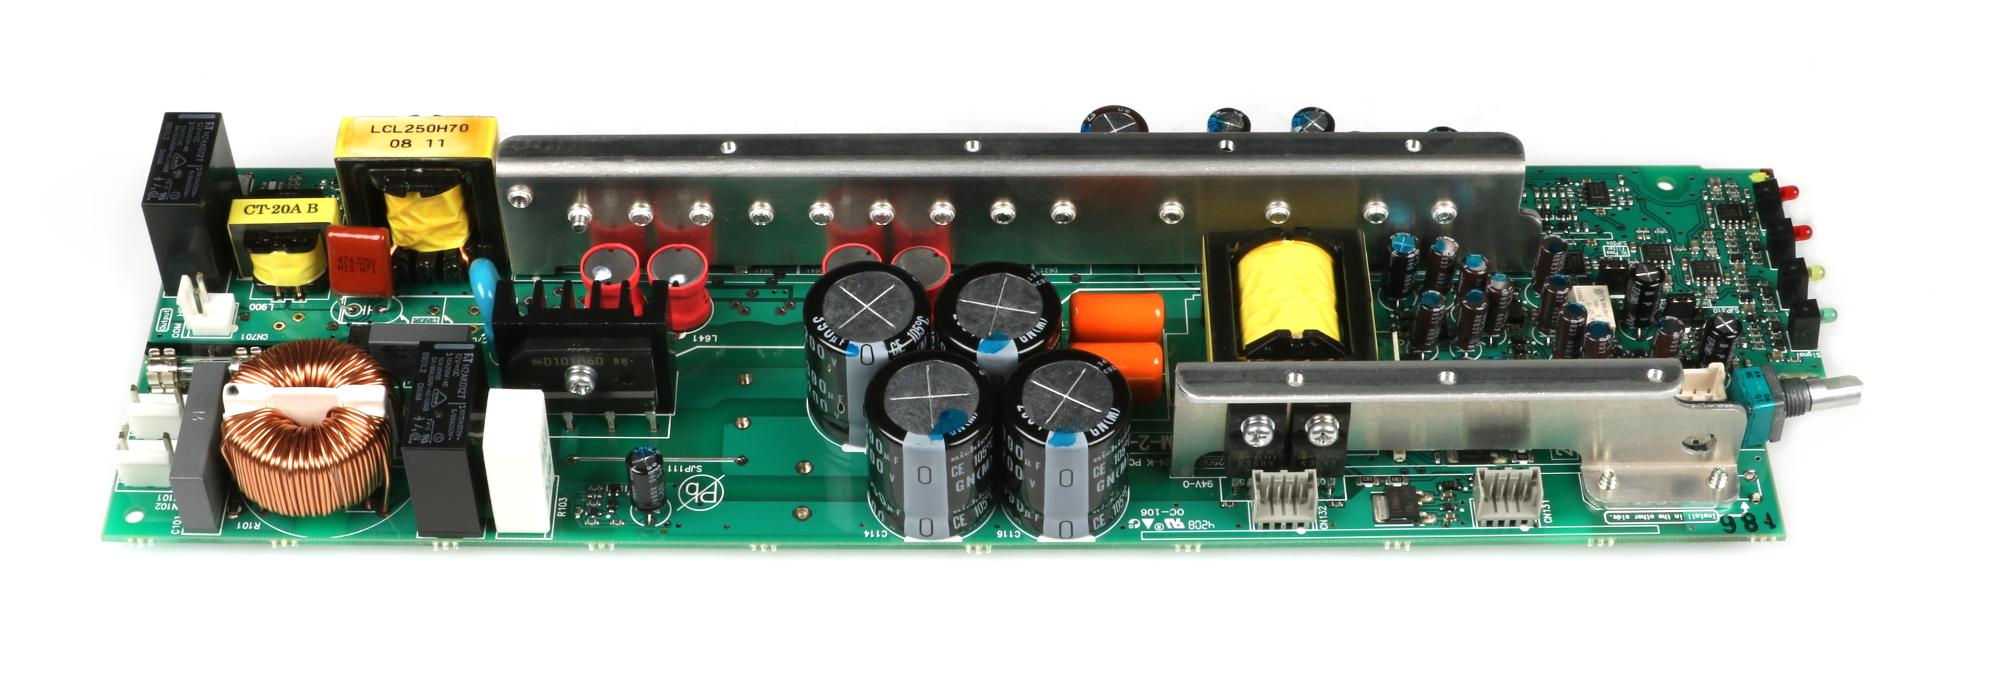 2 & 4 PCB Assembly for DA-250FH